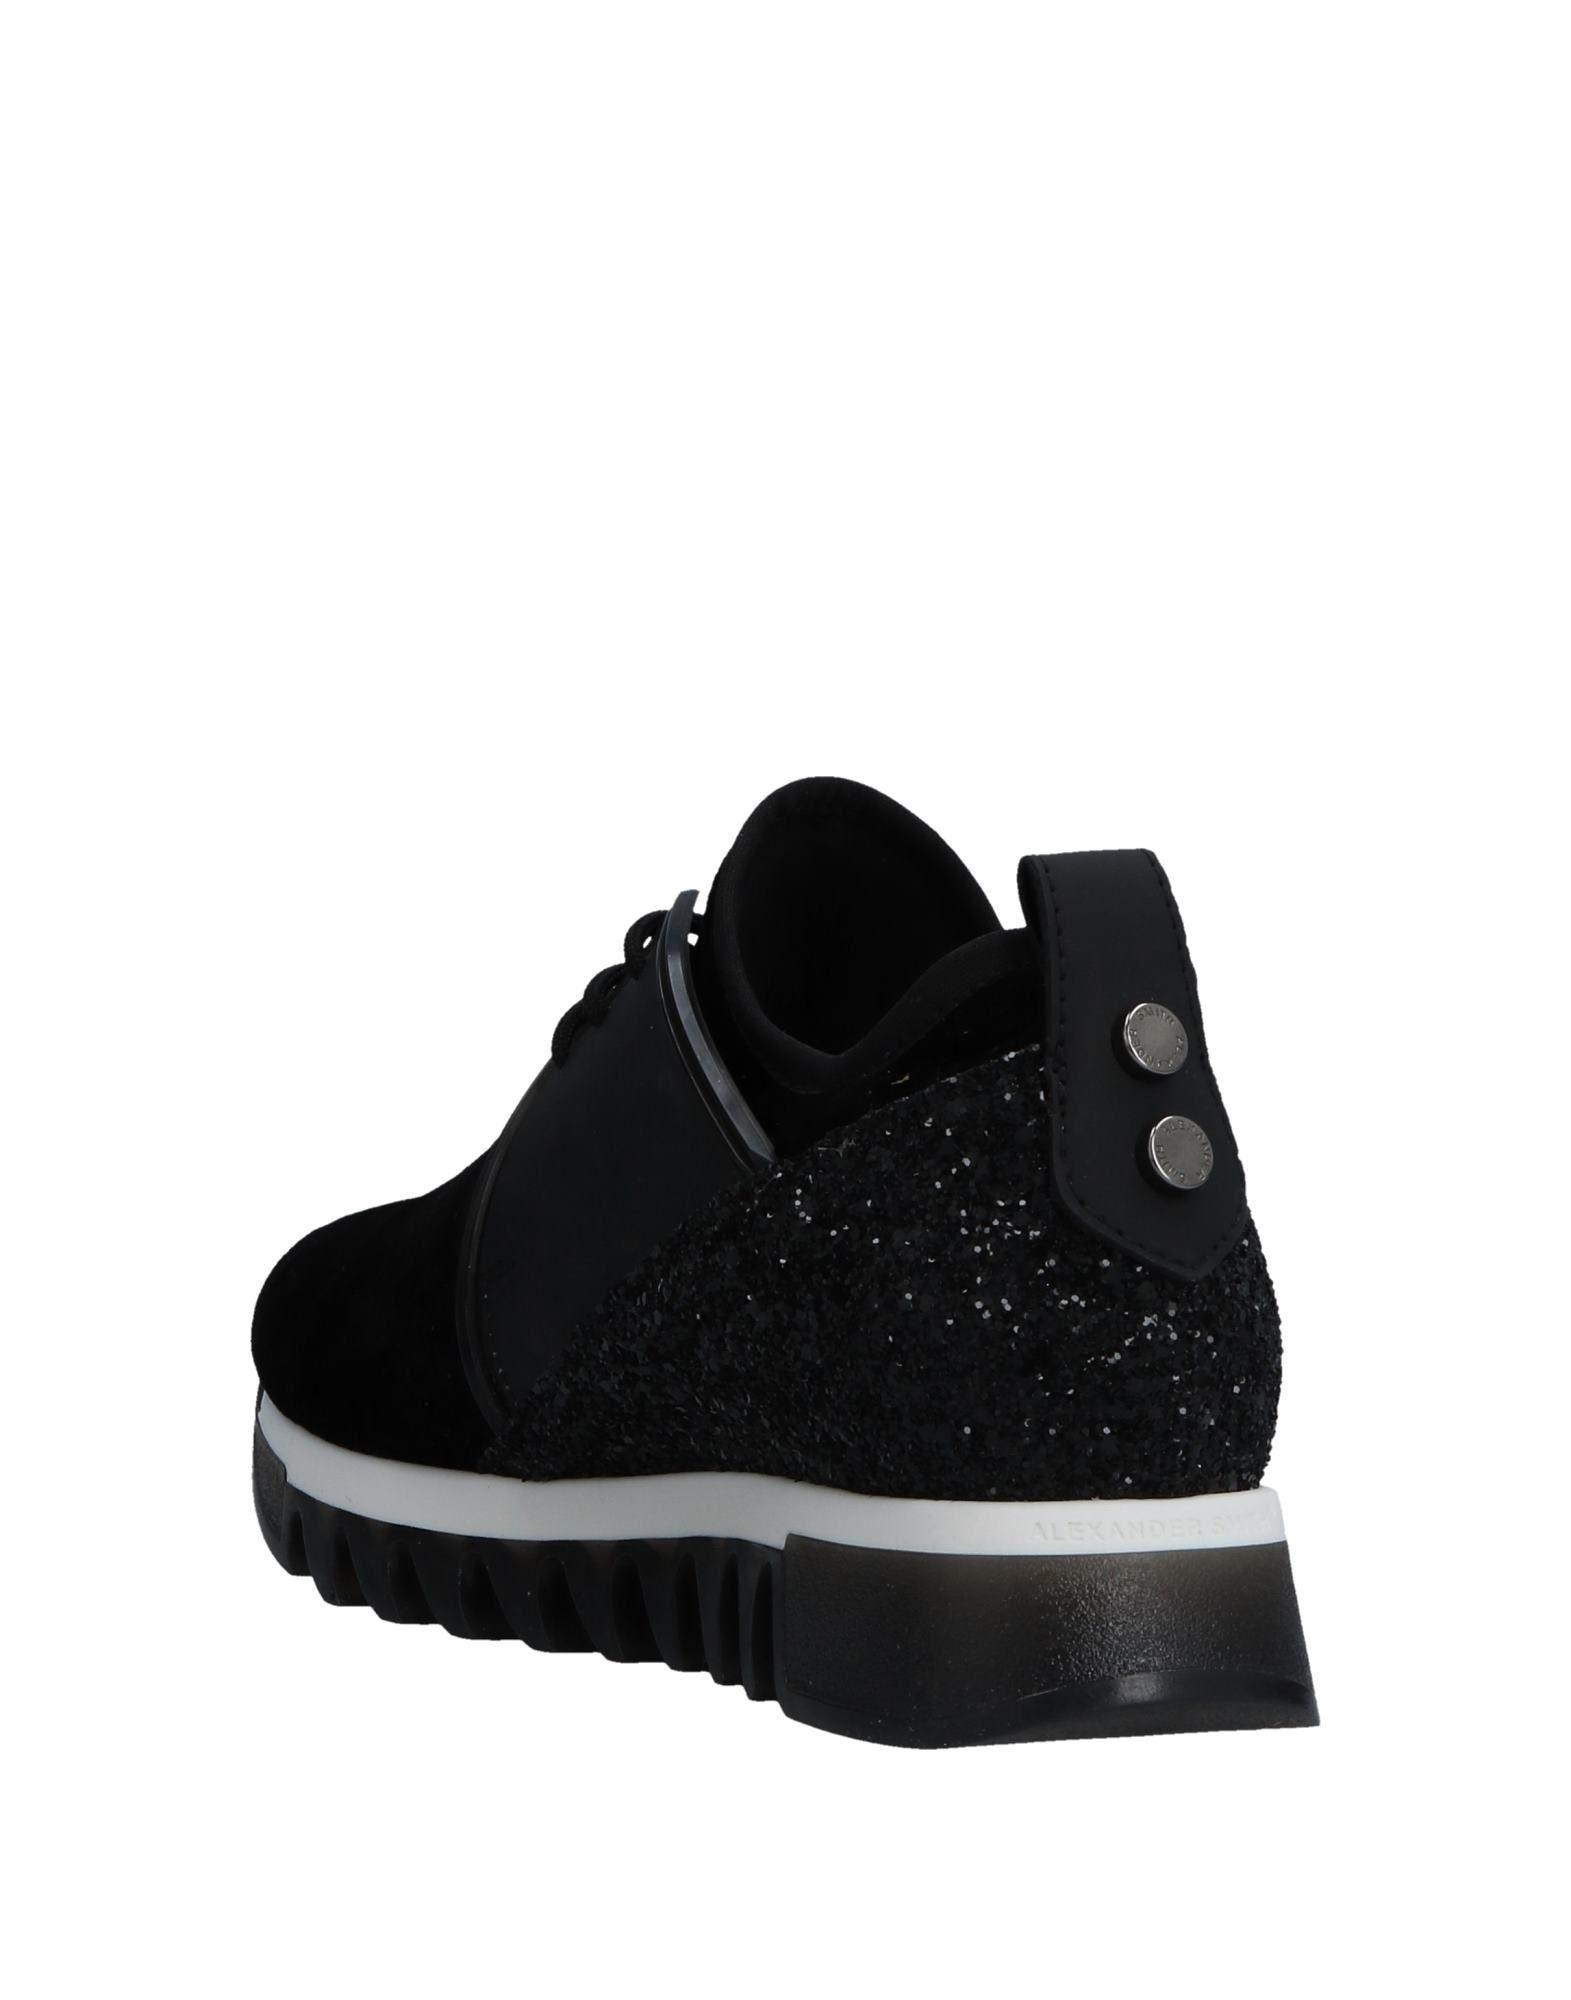 Alexander Smith Sneakers Damen  11527036IE Gute Gute Gute Qualität beliebte Schuhe 987324